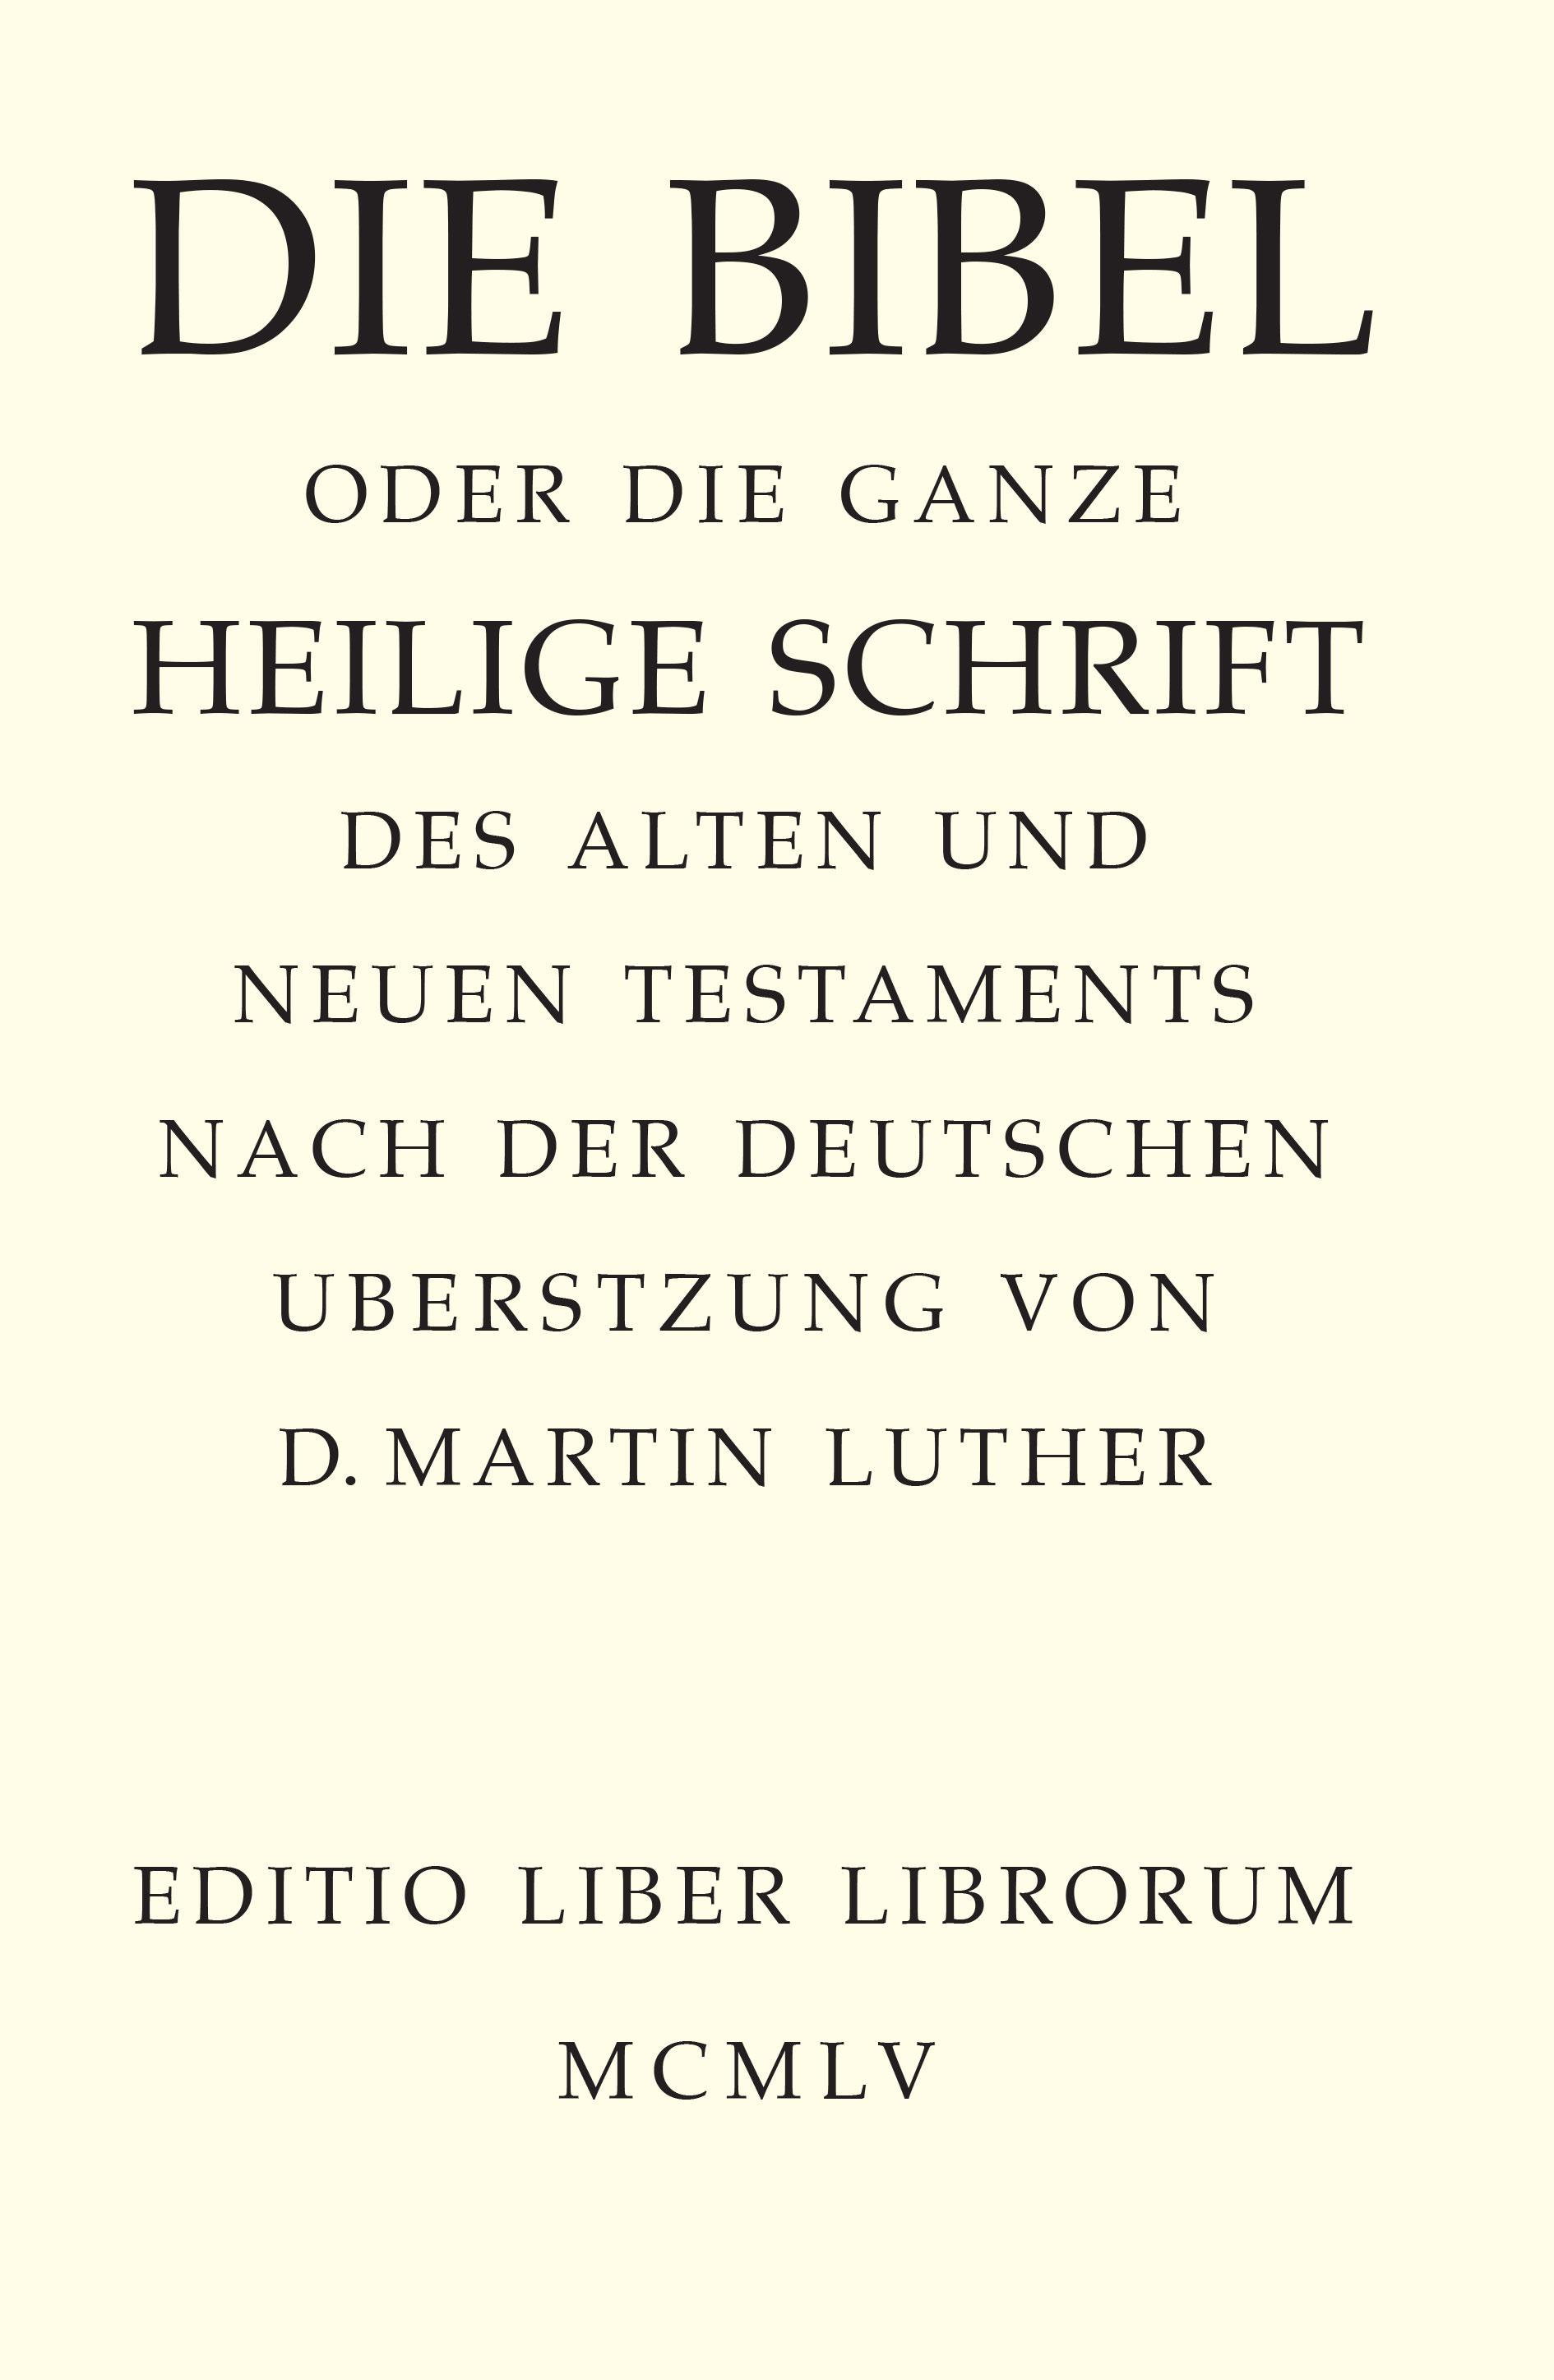 HERMANN ZAPF  Germany, 1955  Palatino  16 X 24.5 cm  Letterpress  Liber Librorum Collection